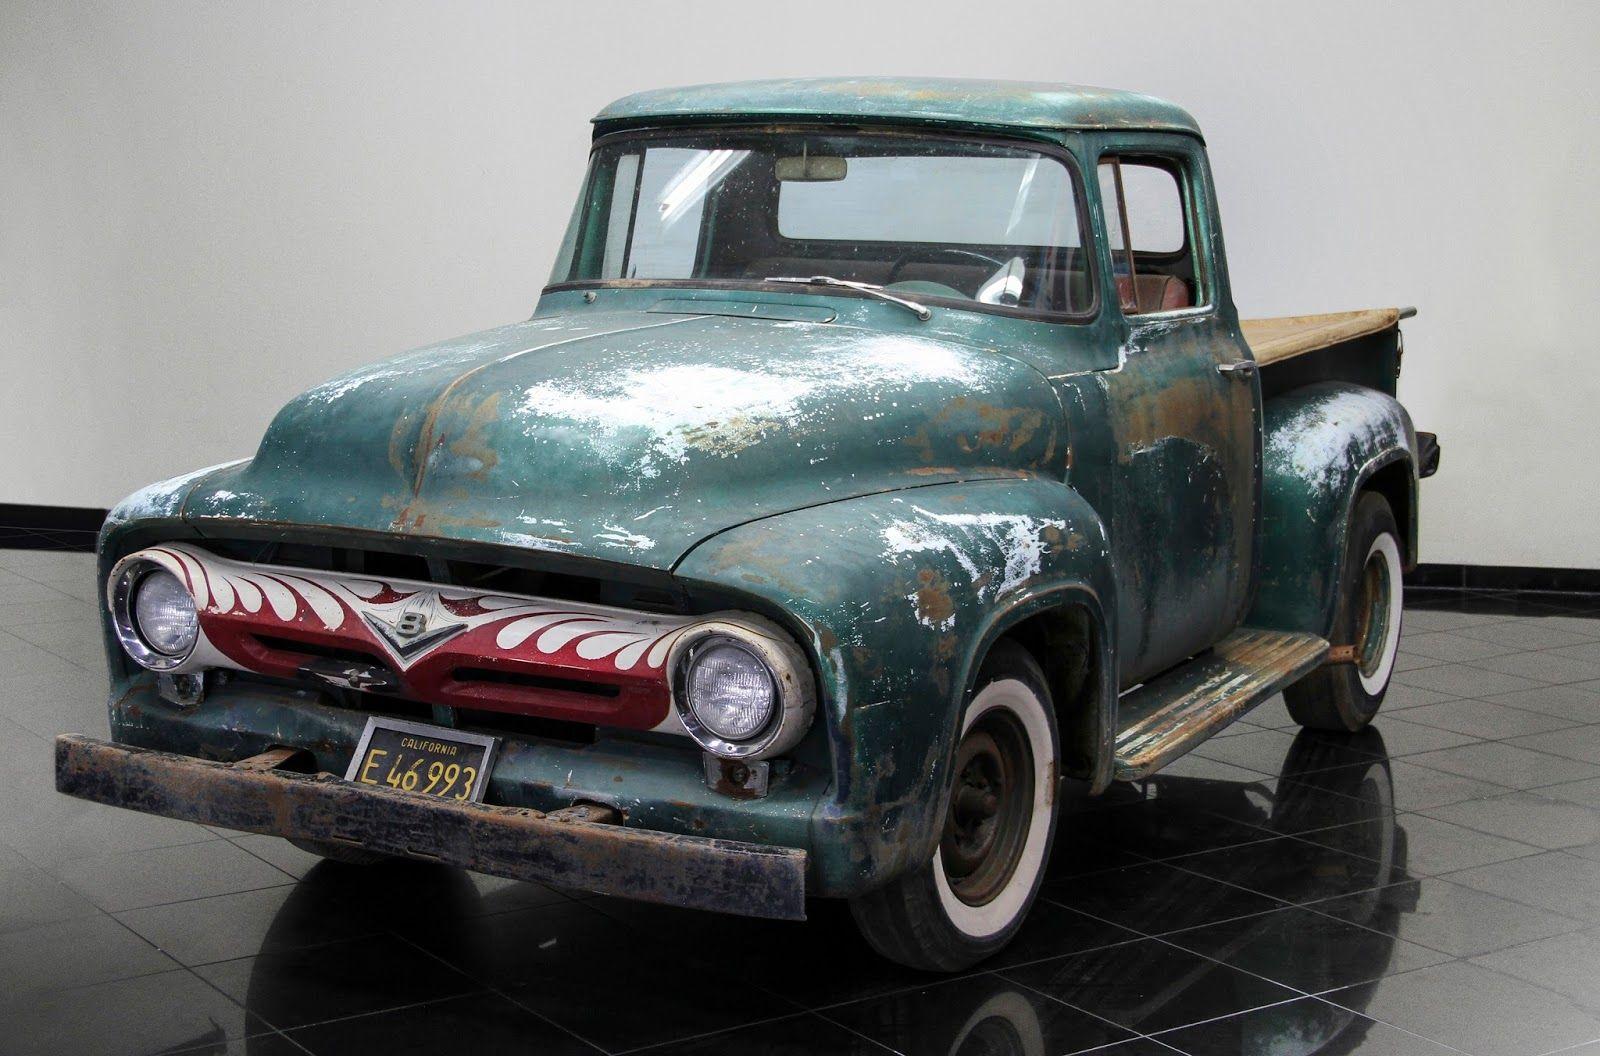 Image by Kingofkings413 on Famous Vehicles Vintage